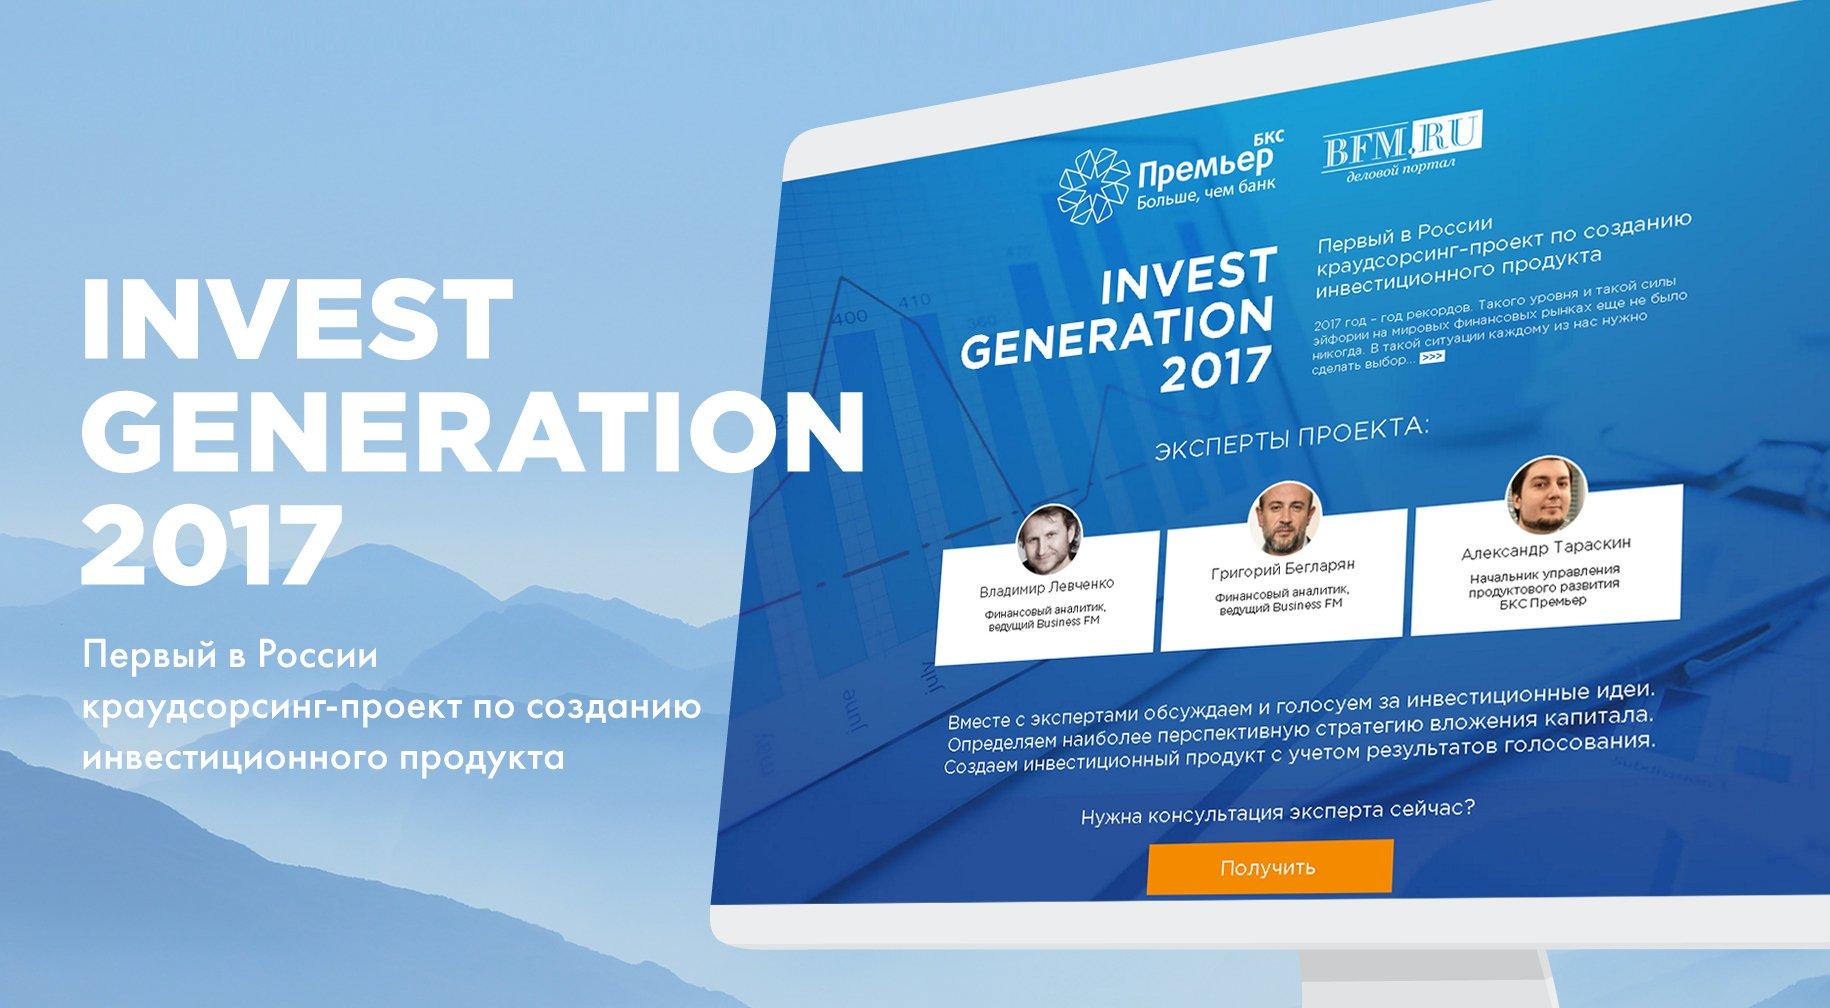 Invest Generation 2017